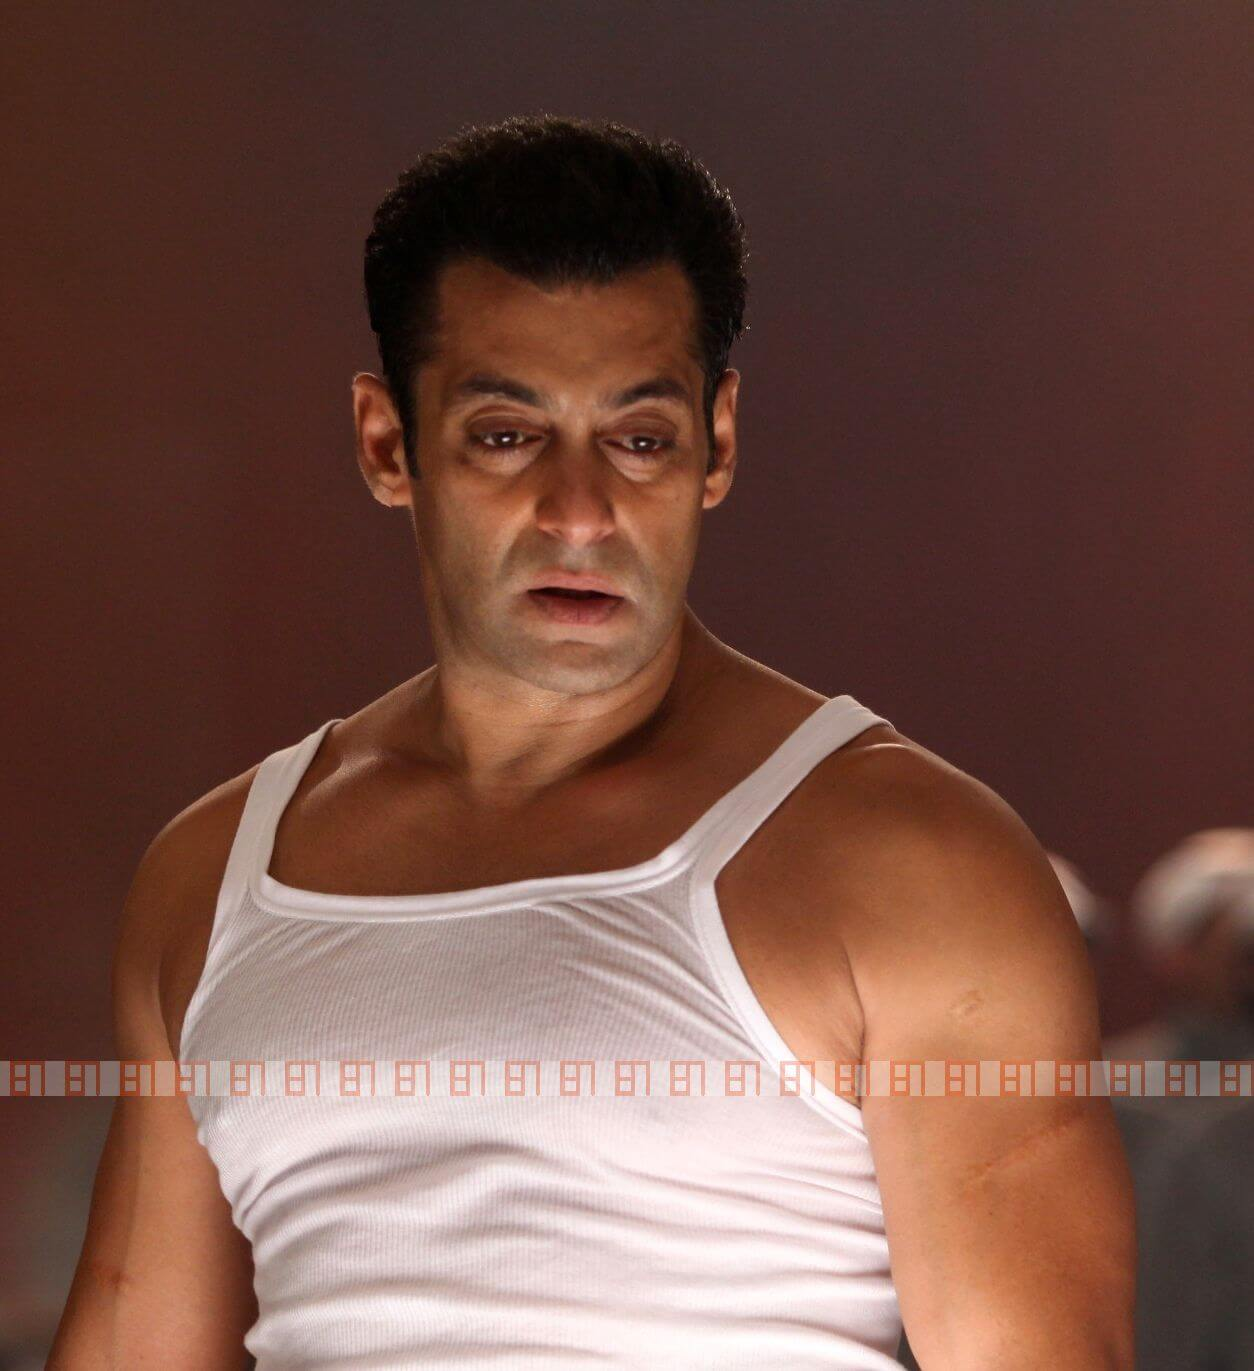 Salman Khan Photo, Age, News, Birthday, Height, Sister, Biography, Girlfriend, Awards, Address, Song, Video, Net Worth, Education, Twitter, Instagram, Facebook, Wiki, Imdb, Website, Youtube (54)